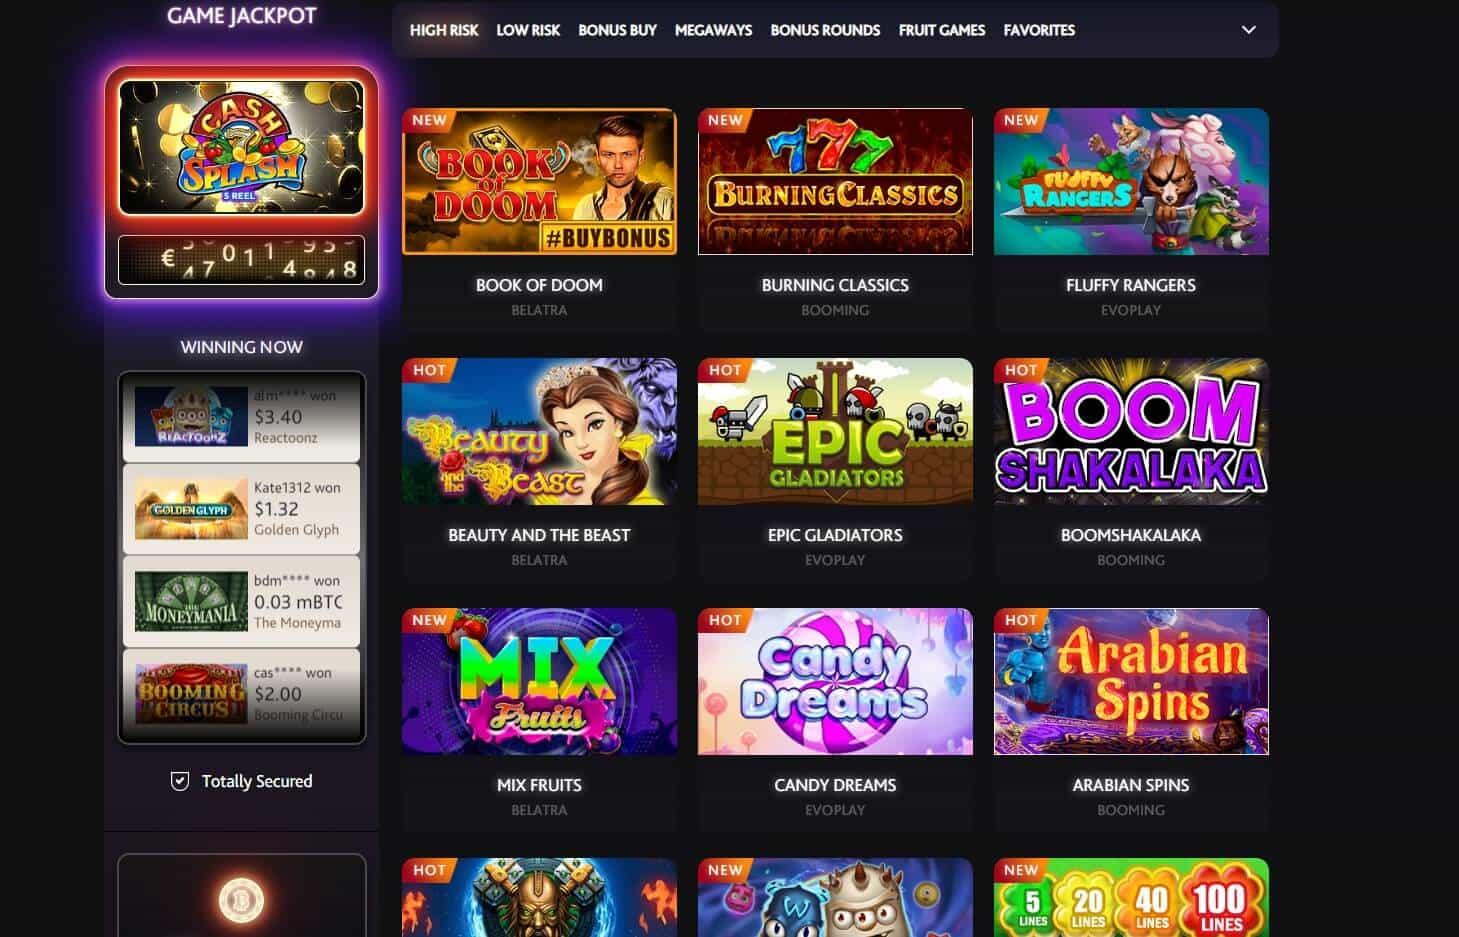 7bit Casino games